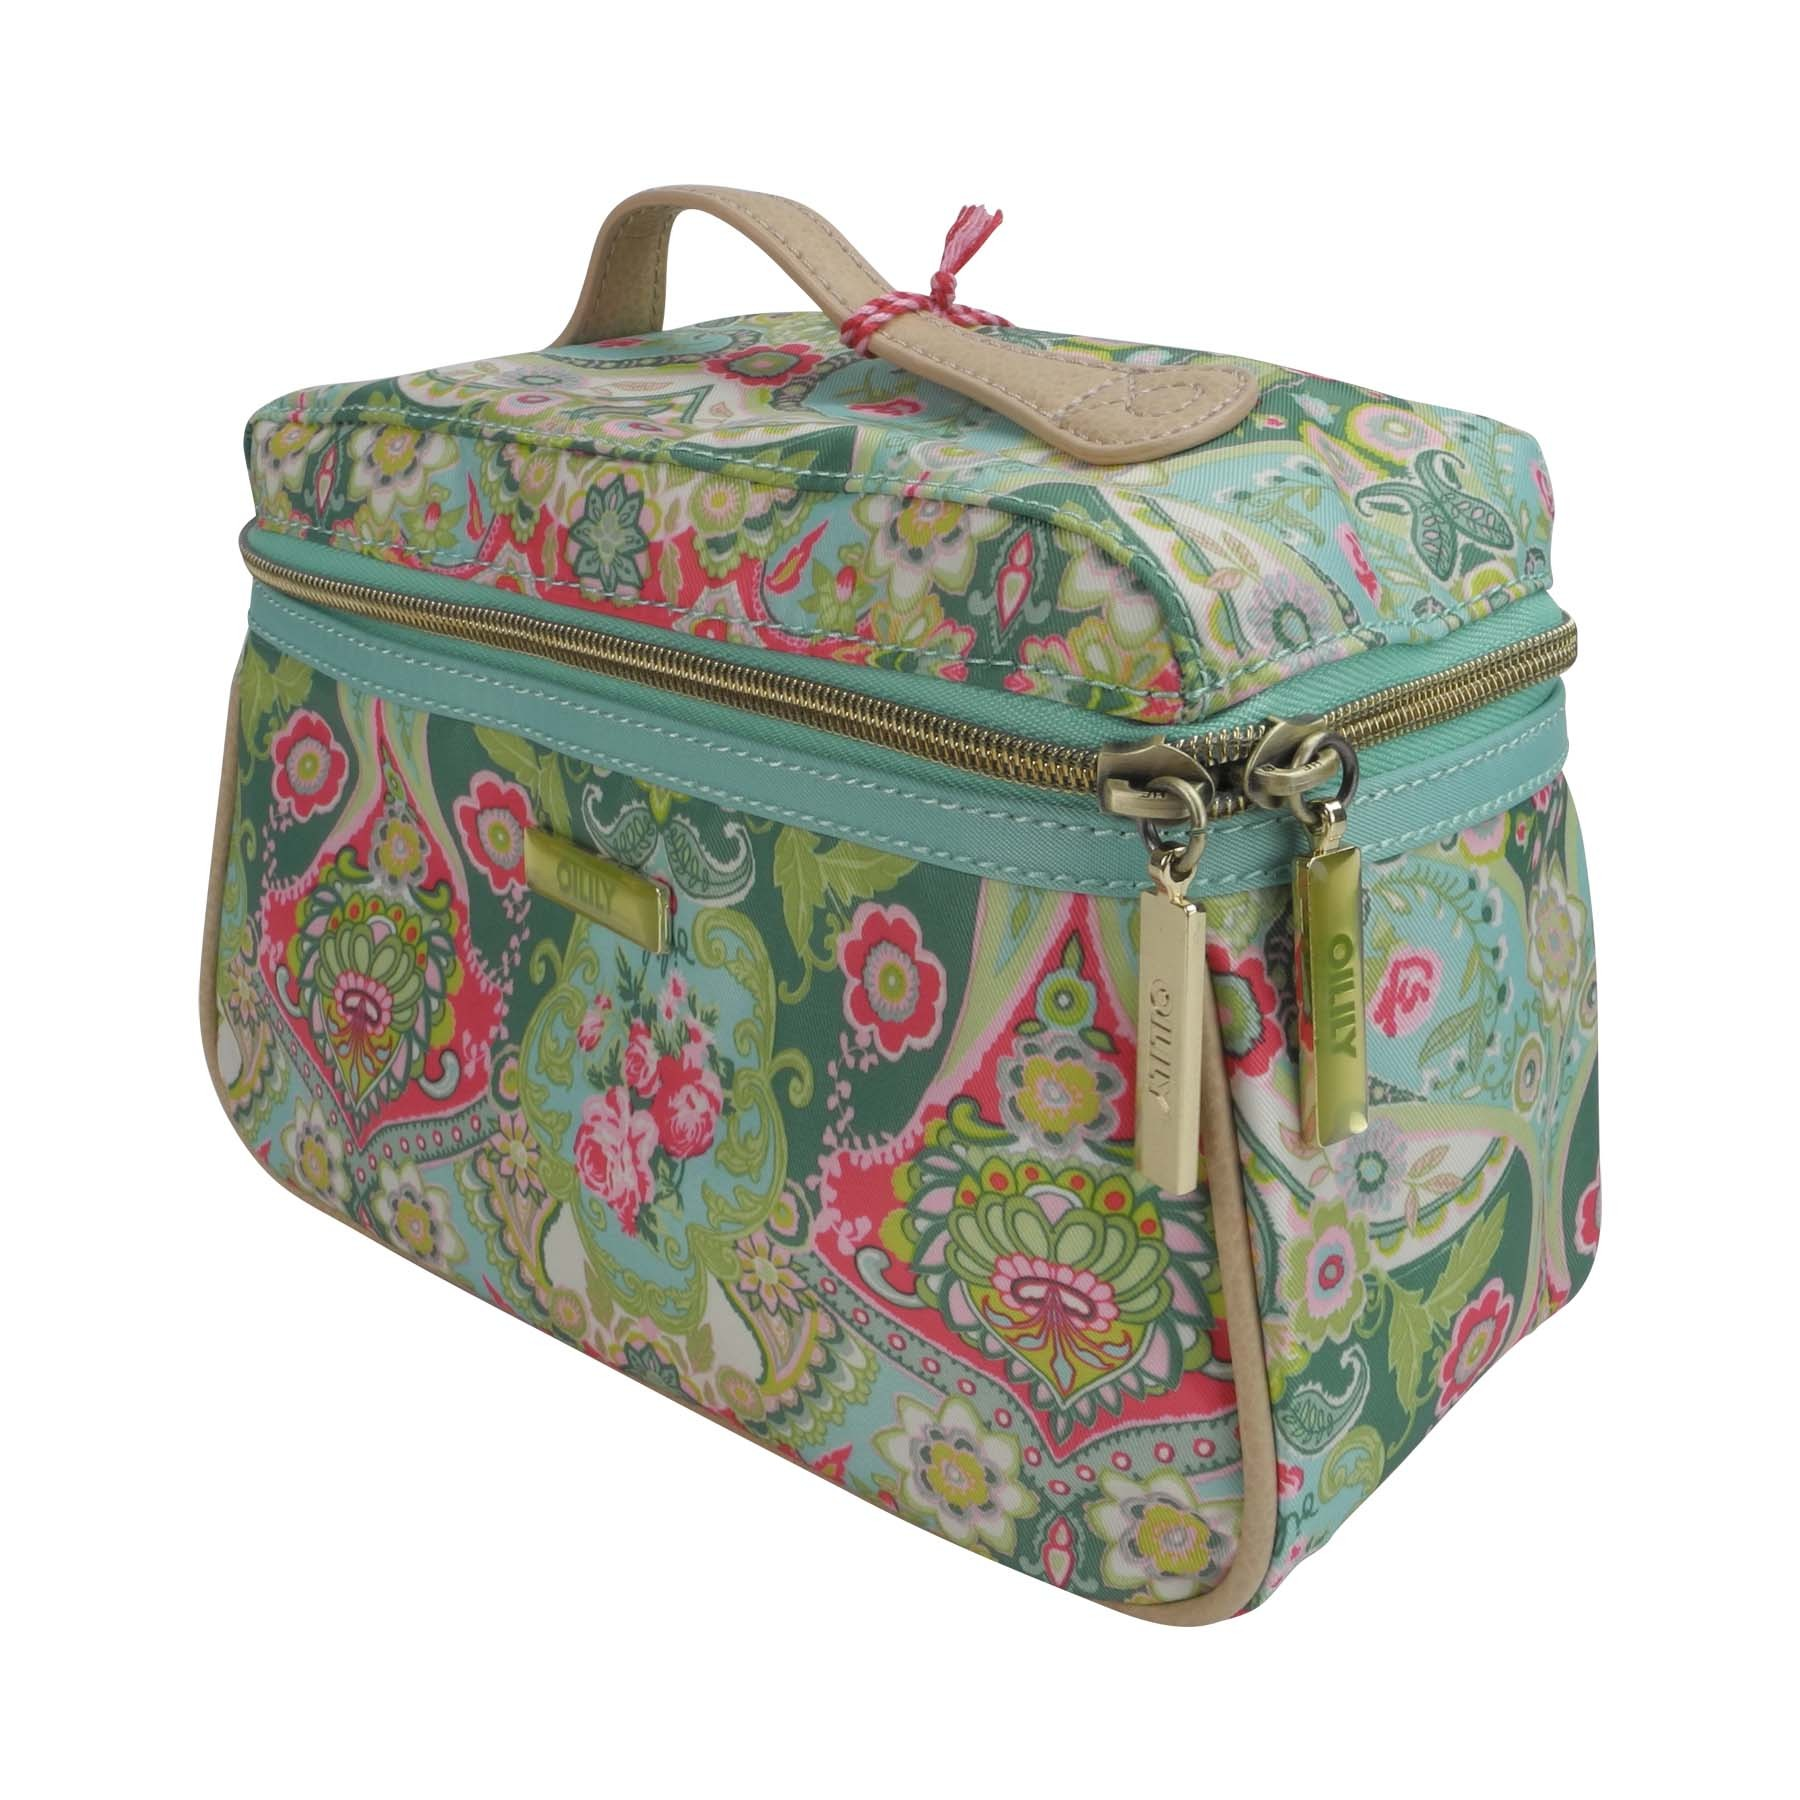 oilily summer mosaic kosmetiktasche m beauty case apple ebay. Black Bedroom Furniture Sets. Home Design Ideas